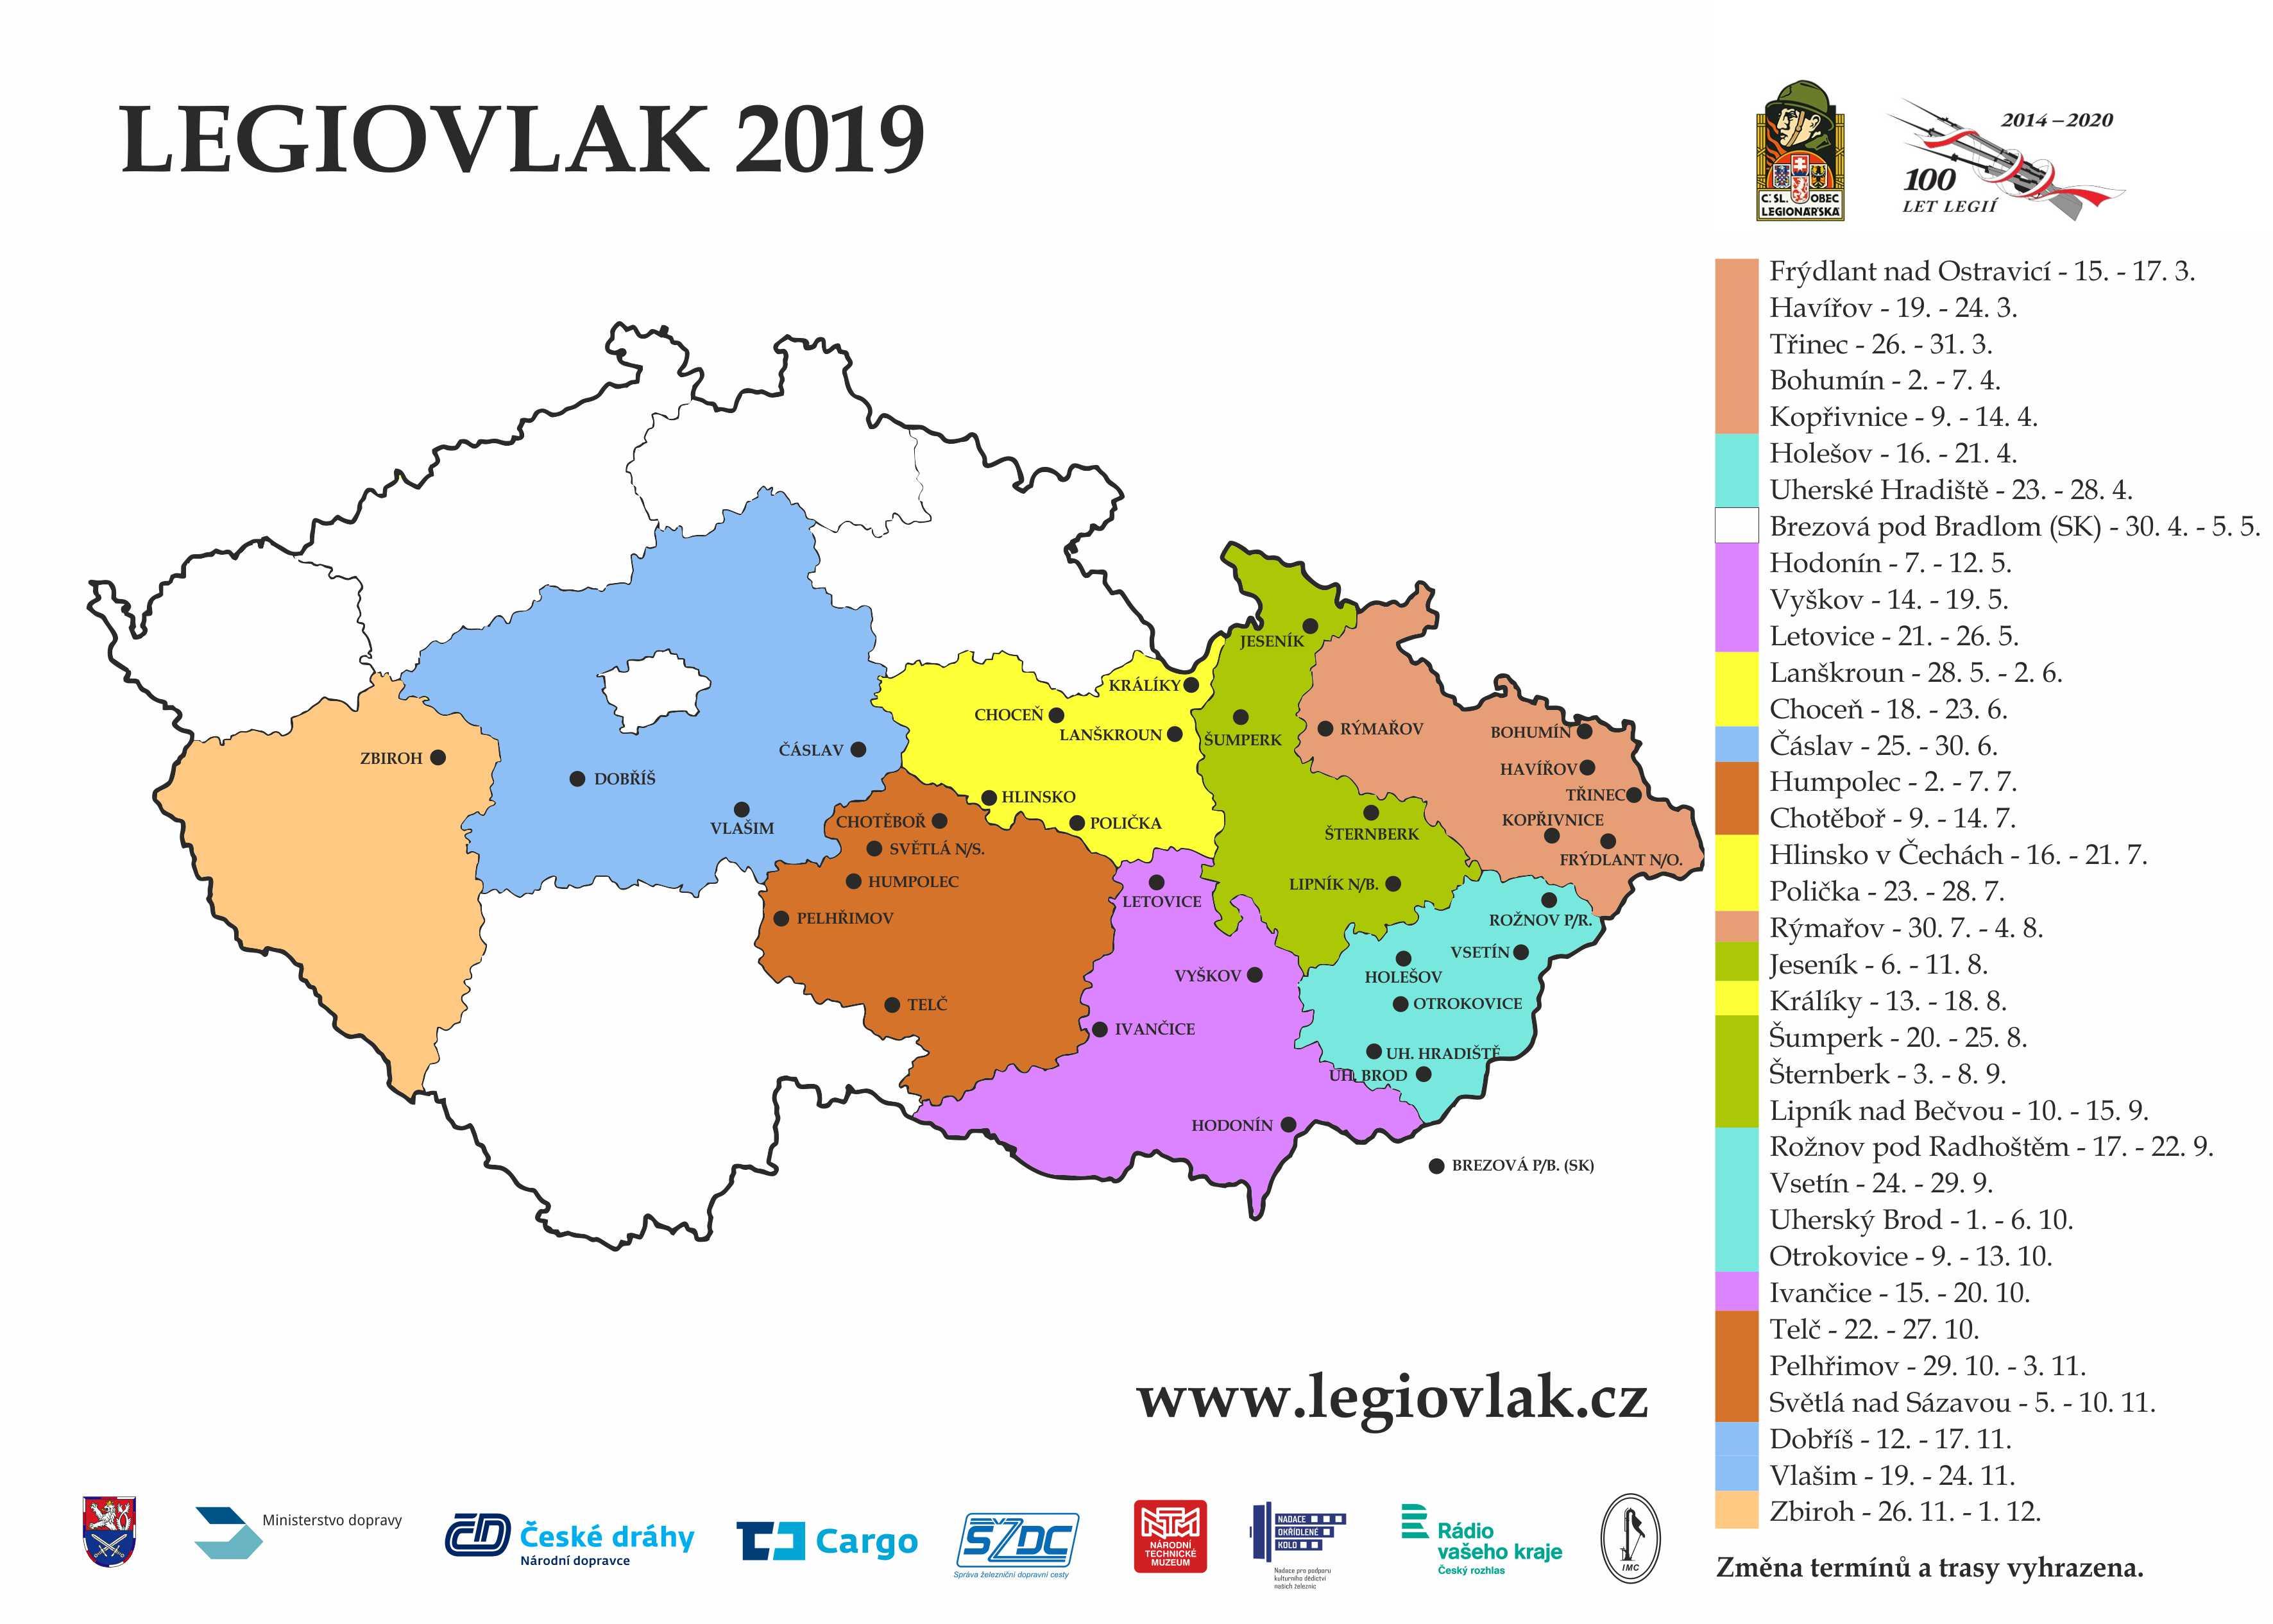 Trasa Legiovlaku 2019